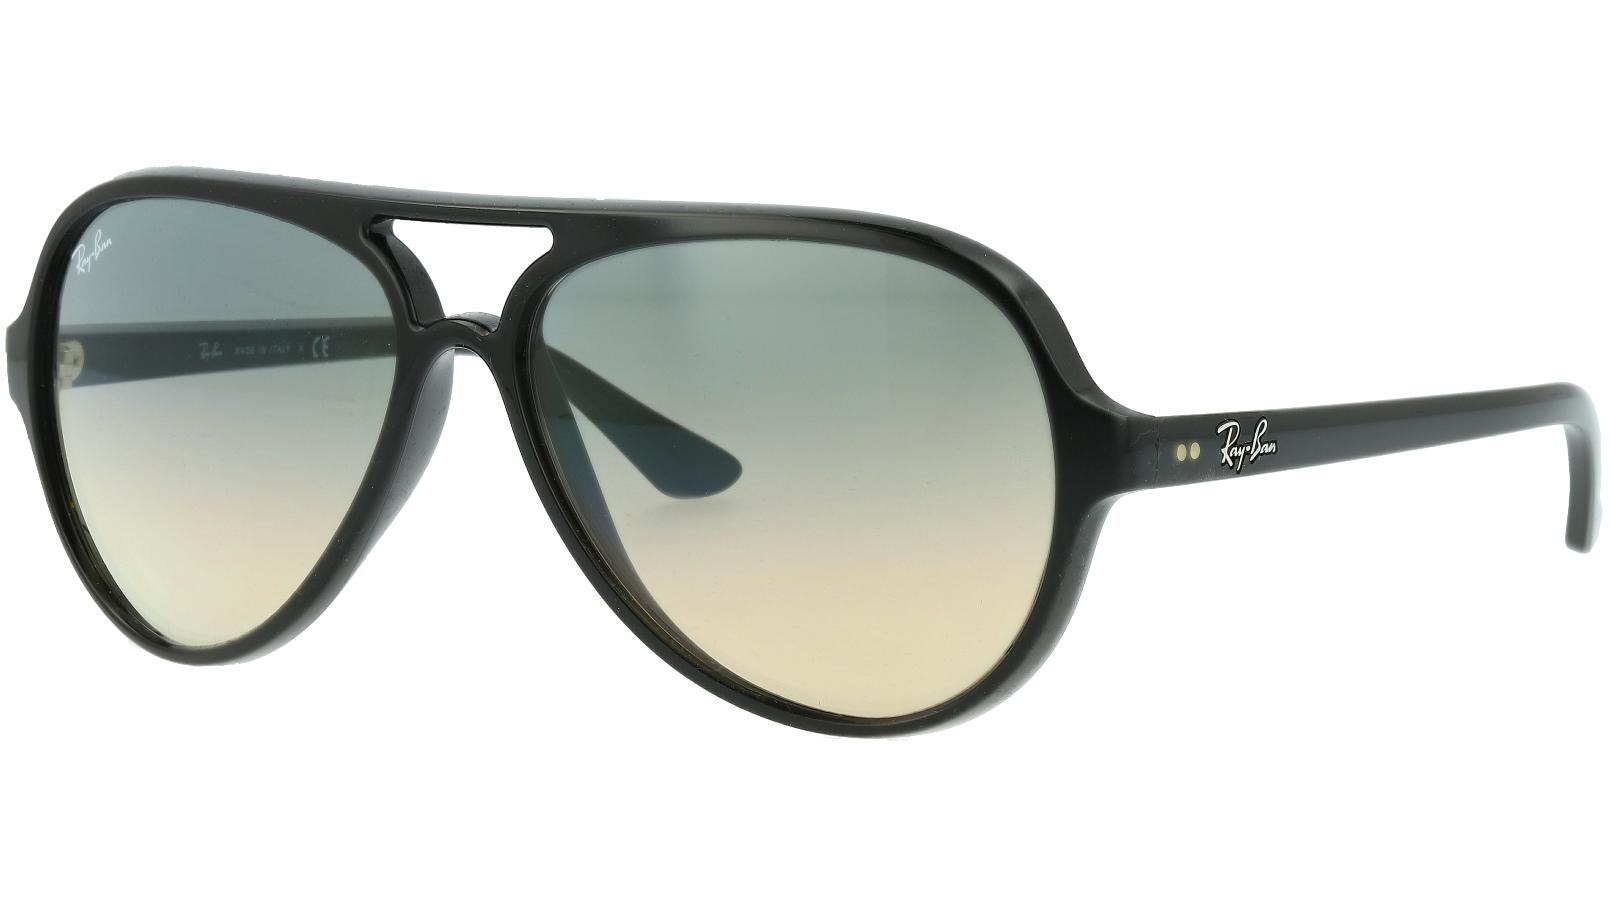 Ray-Ban RB4125 601/32 Black Sunglasses